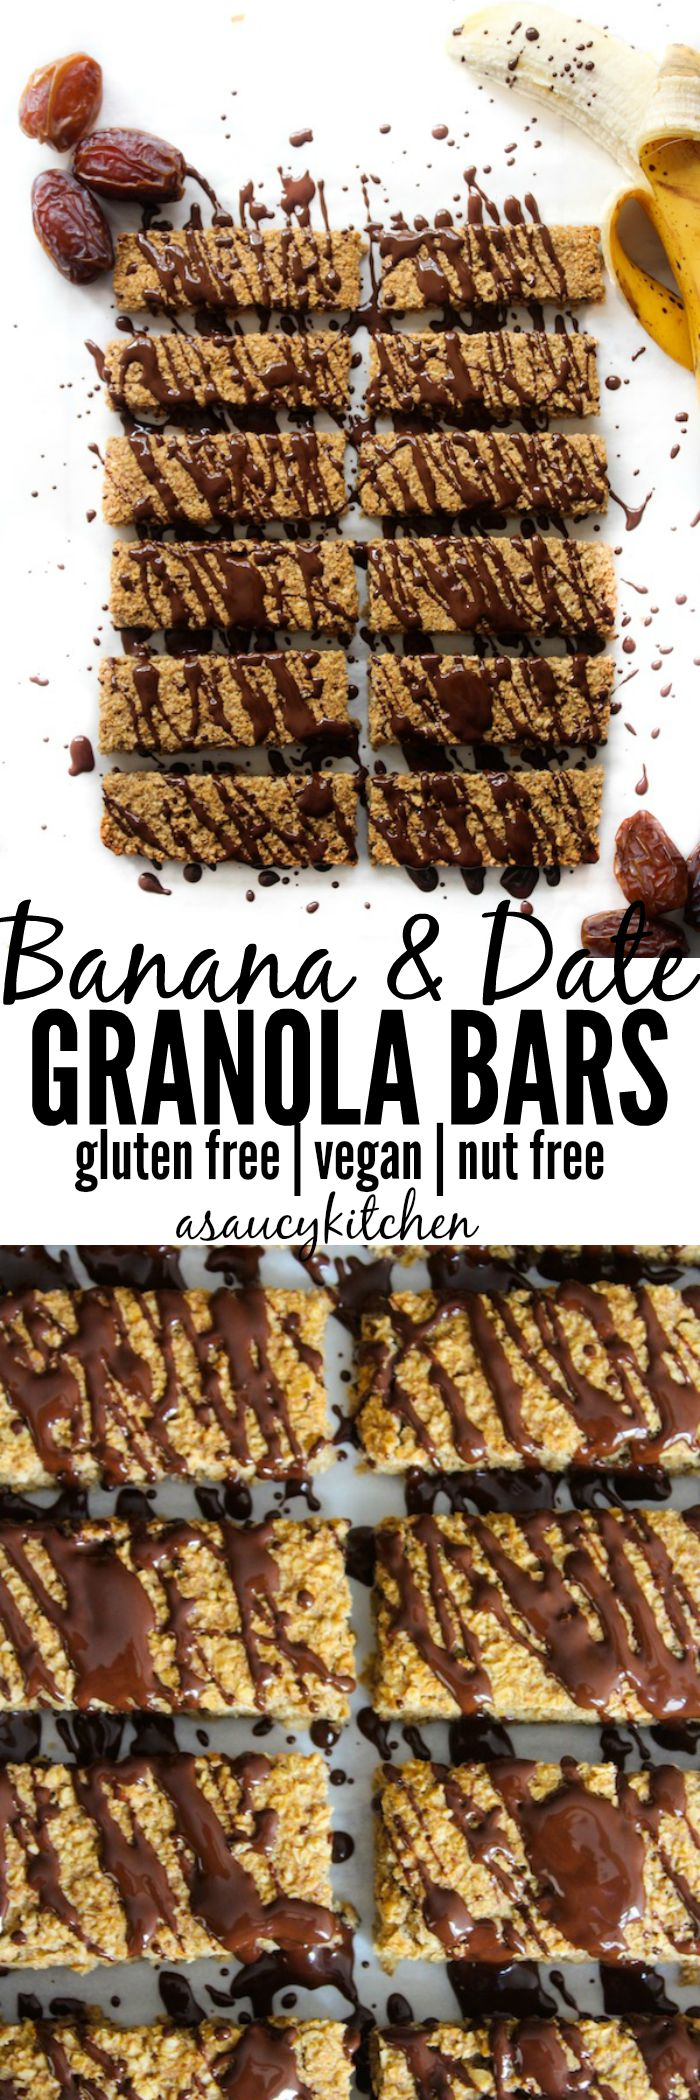 Banana & Date Granola Bars gluten free, nut free, vegan www.asaucykitchen.com